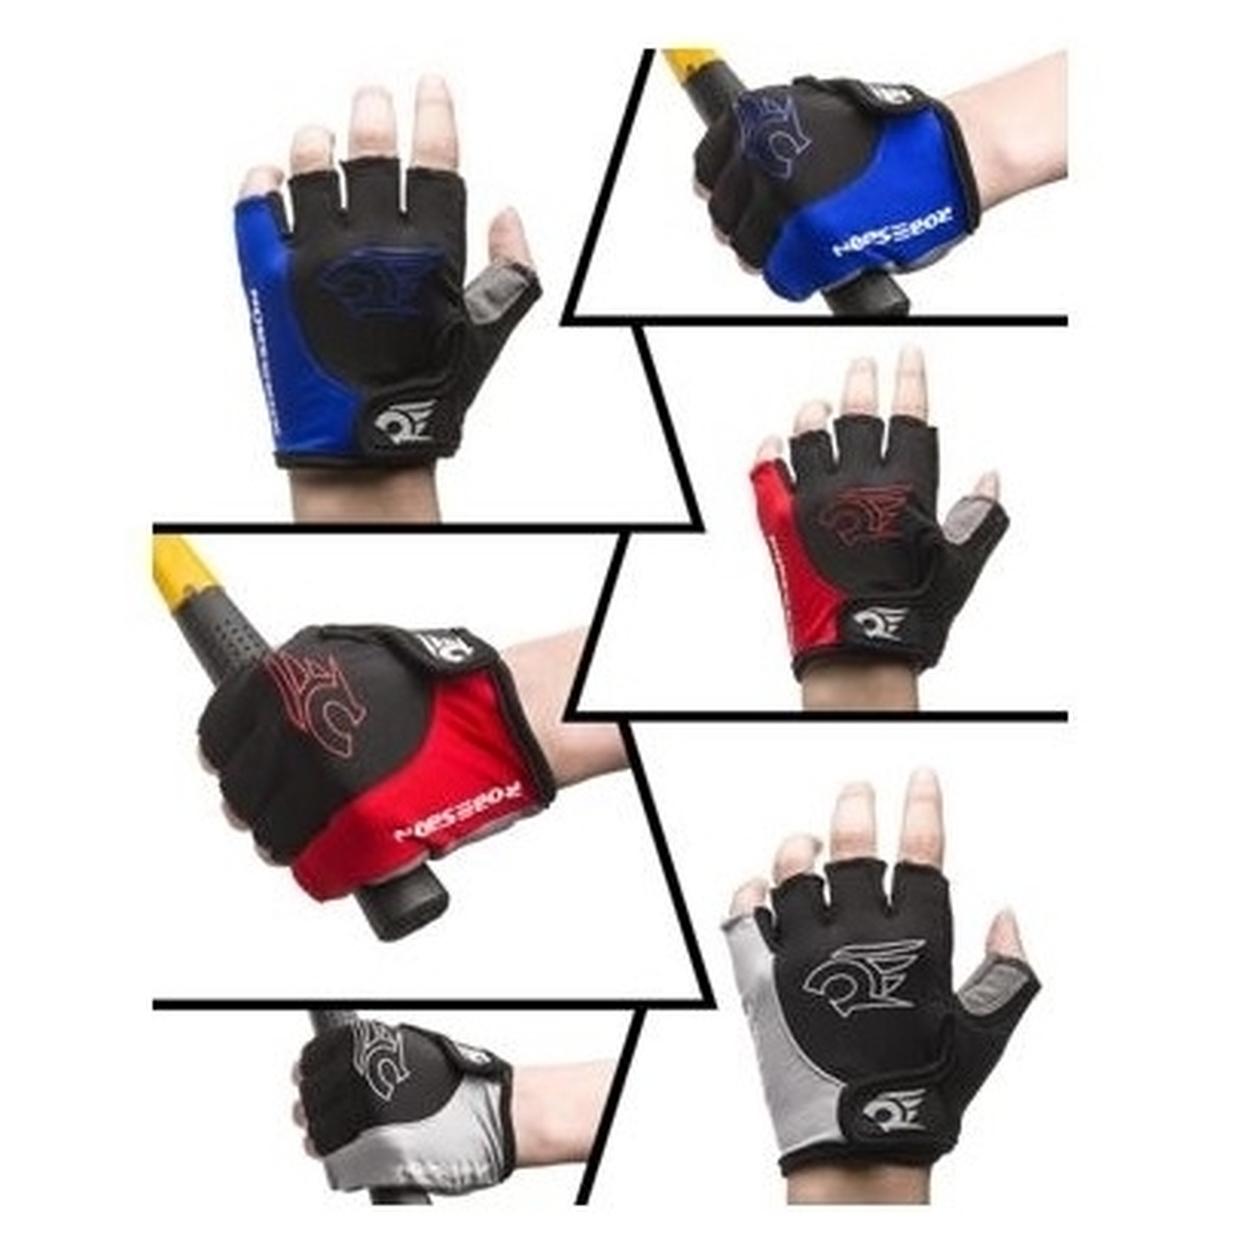 Cycling Gloves - Red, Medium 5978c0a0a020af16d41f240c